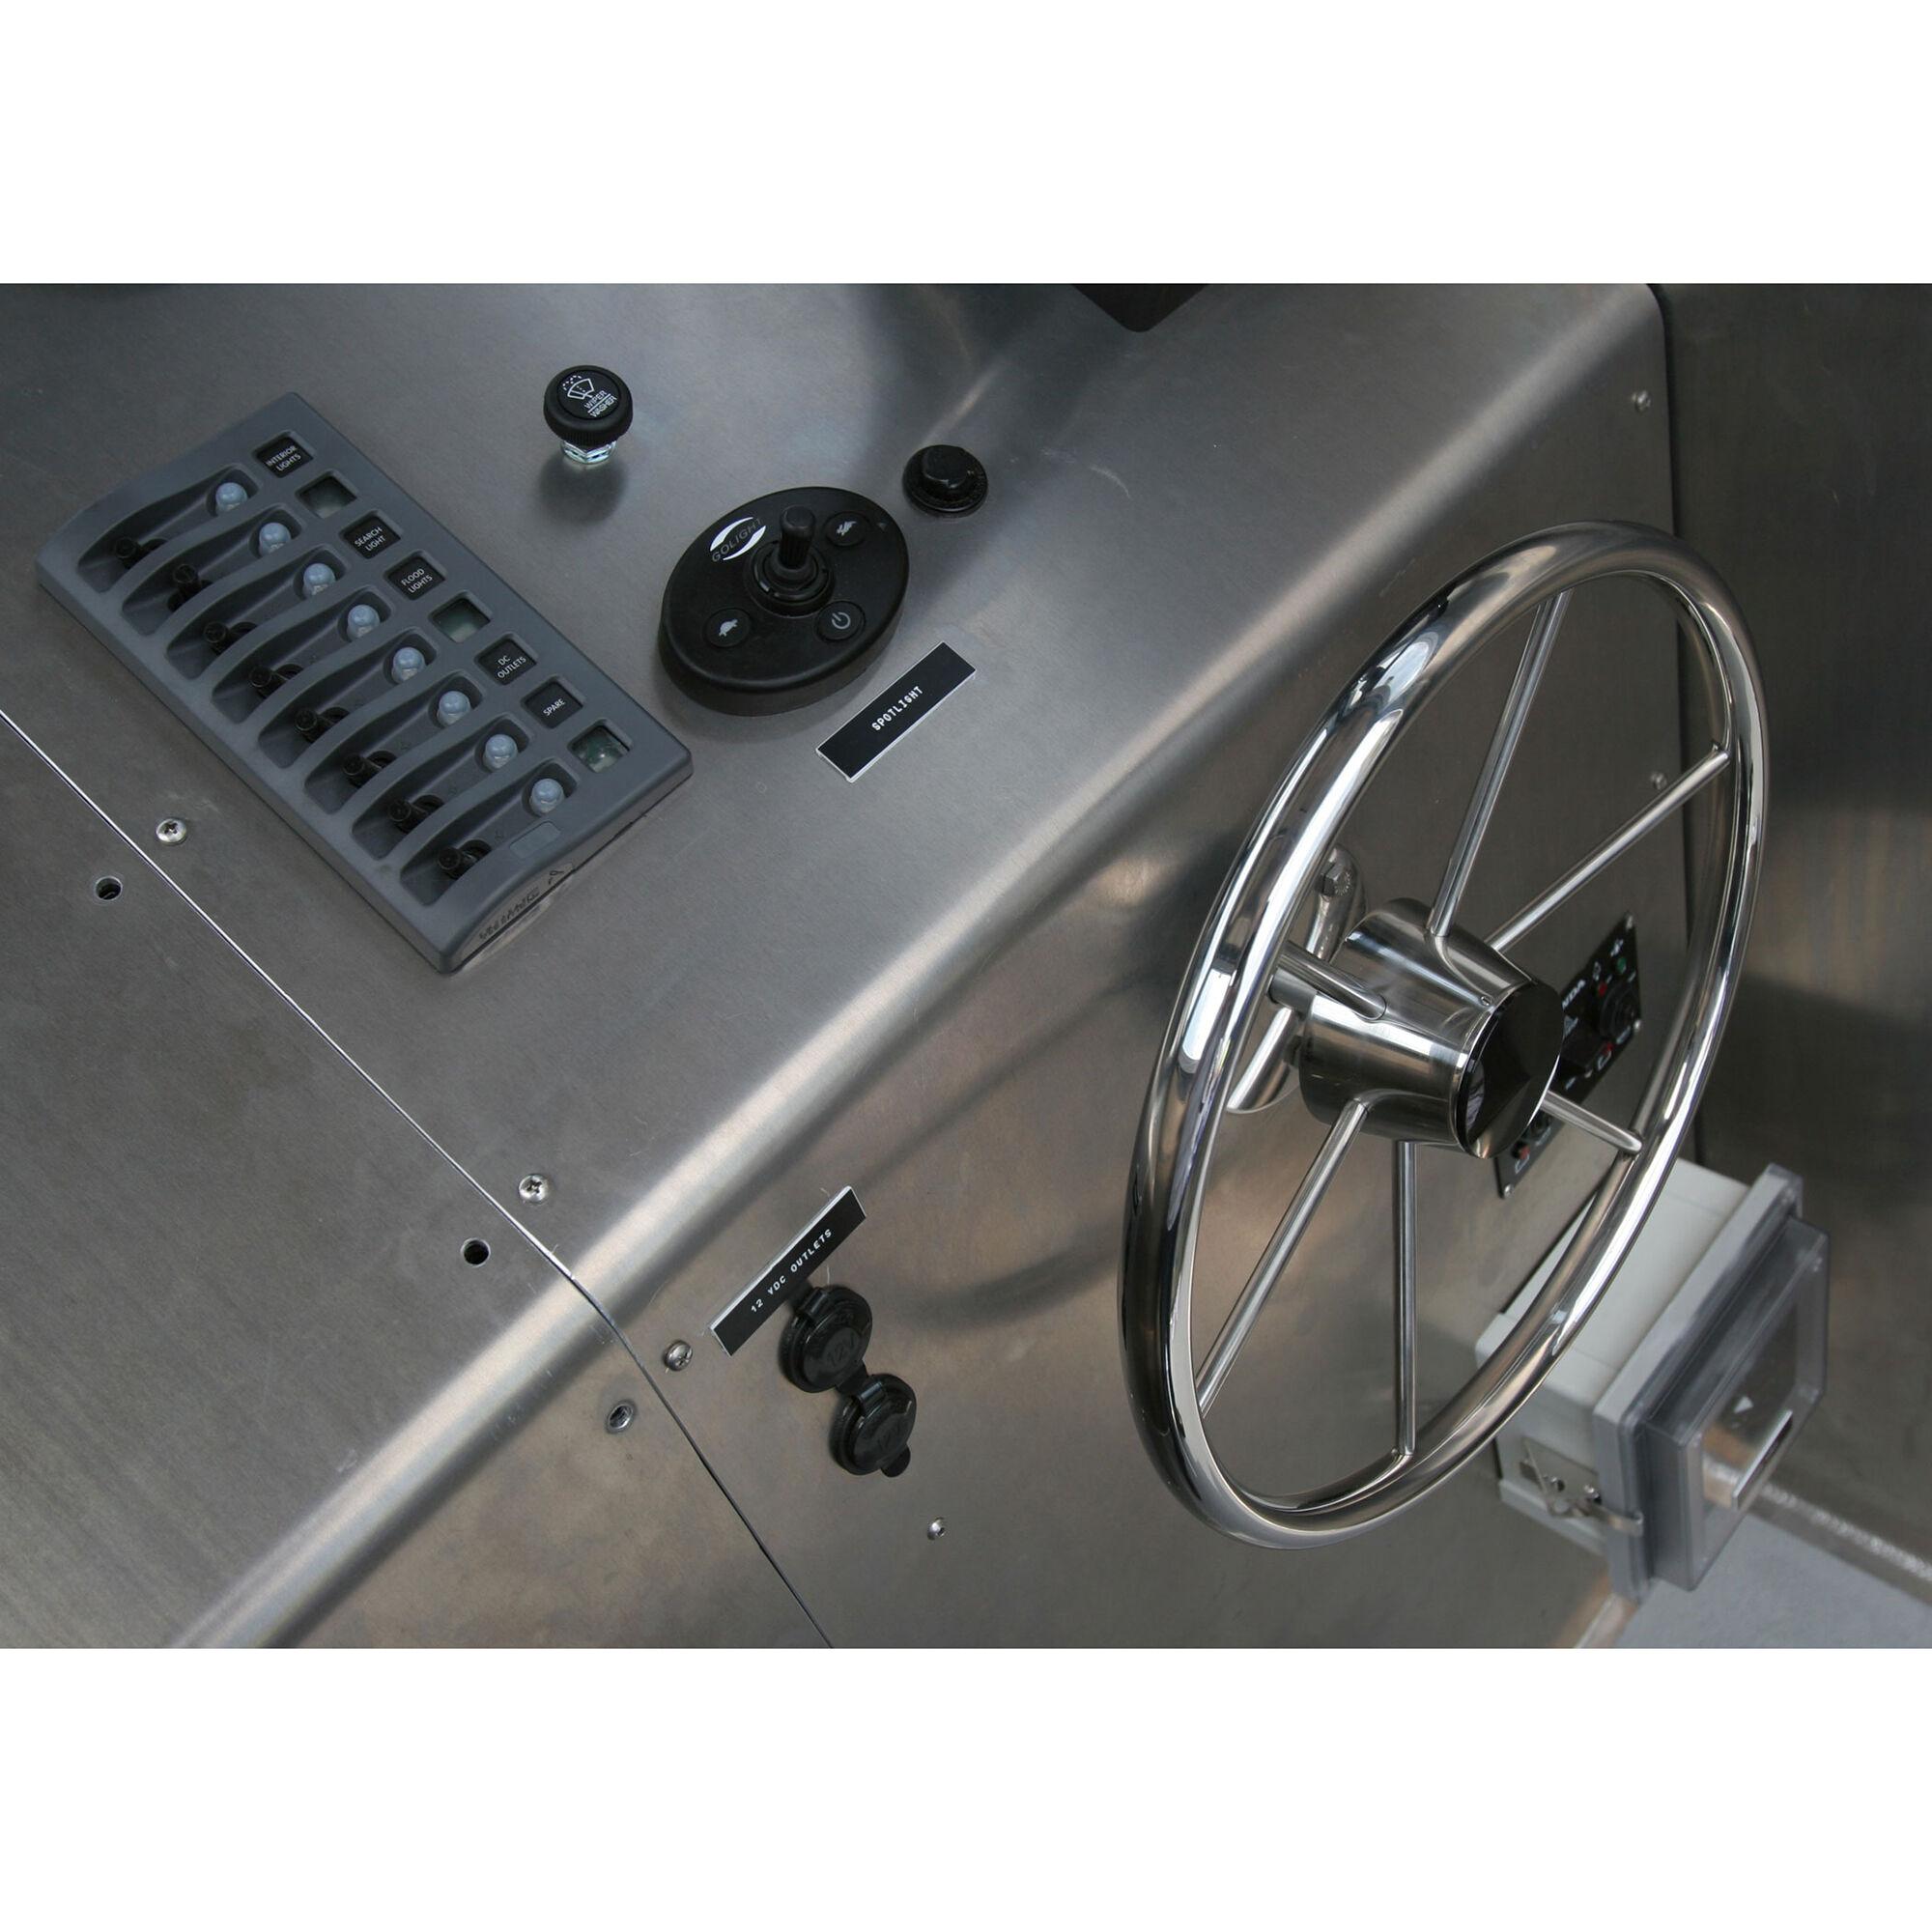 4378 Blue Sea 4378 WeatherDeck Water Resistant Circuit Breaker Panel 8 Position